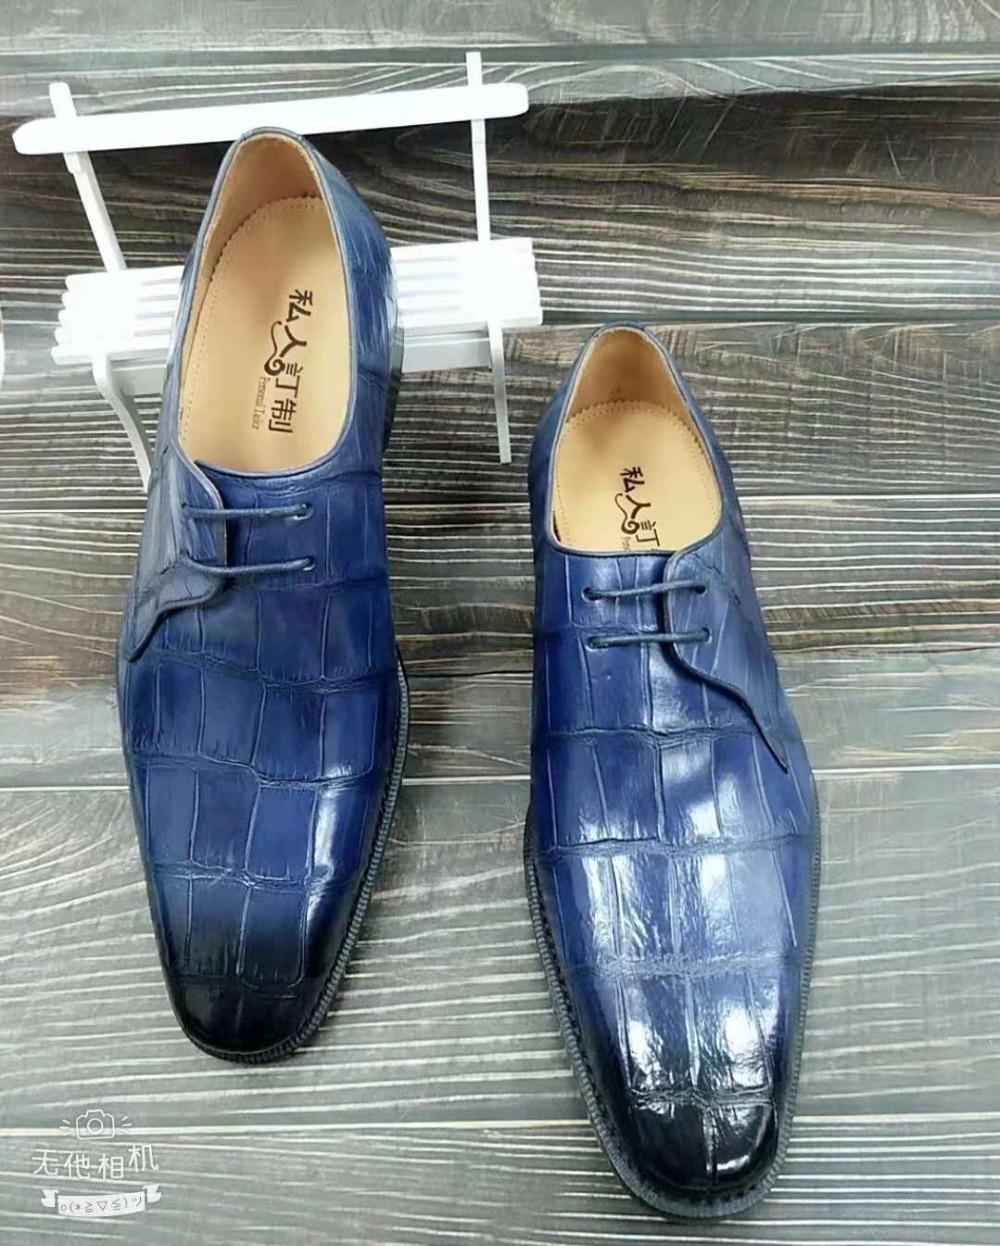 Inventive 100% Genuine Real Crocodile Belly Skin Men Shoe Durable Solid Dark Blue Color Matt Crocodile Belly Skin Men Business Dress Shoe Shoes